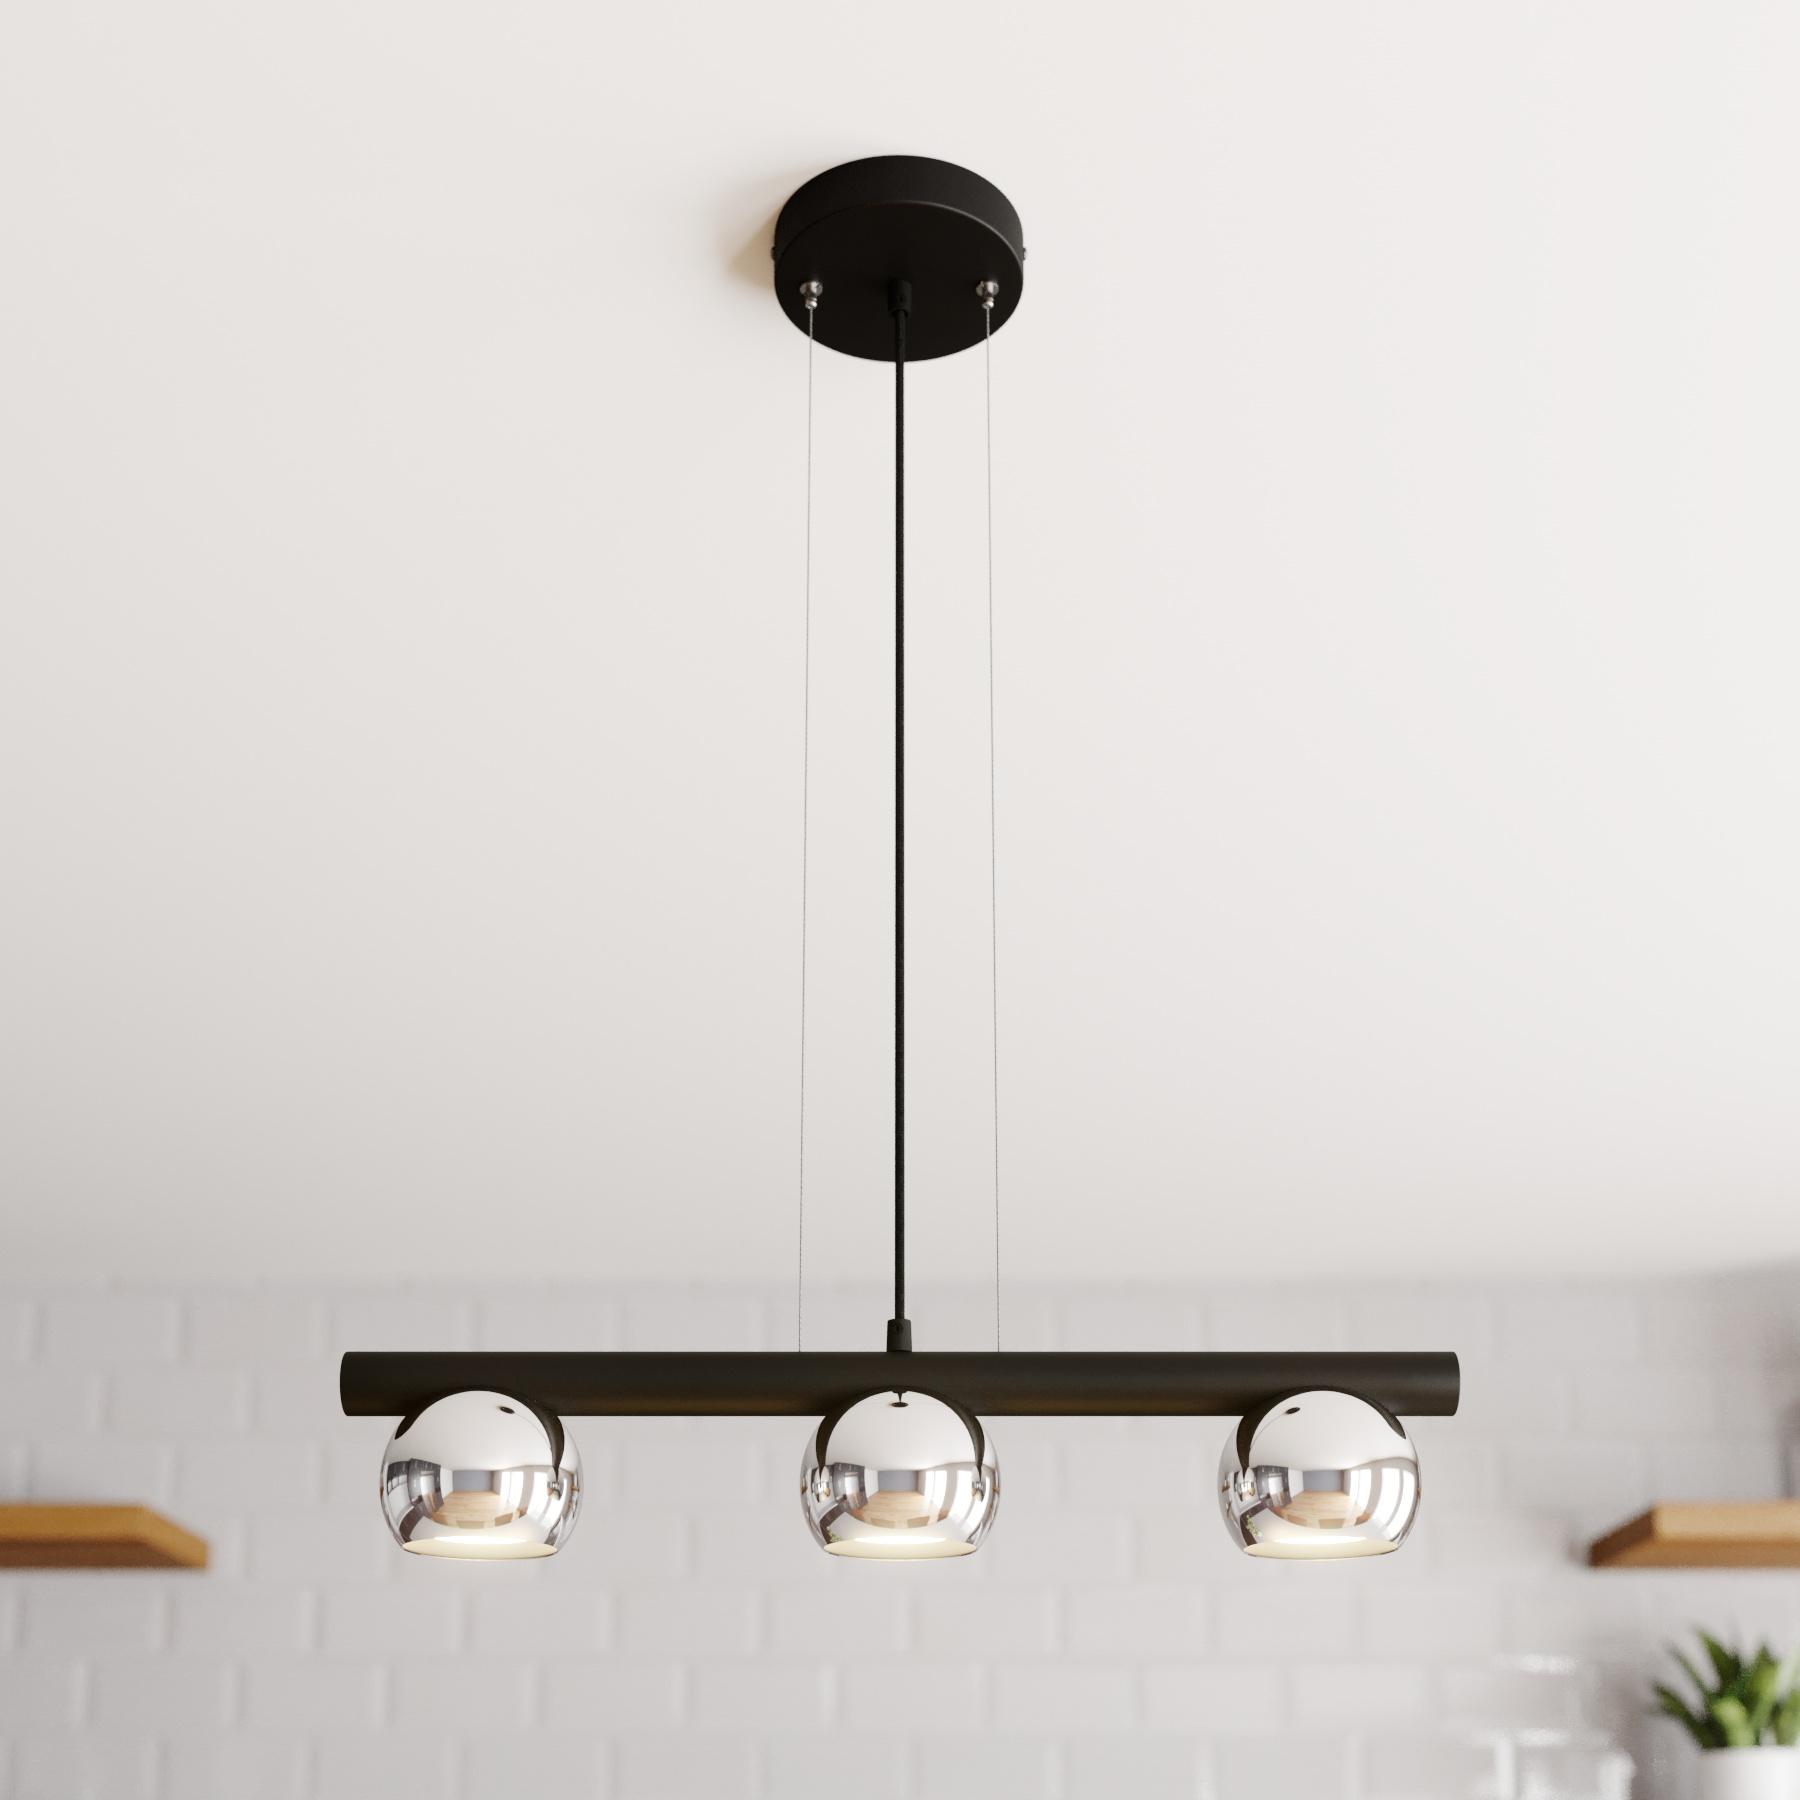 Hanglamp Hippo, 3-lamps, zwart en chroom